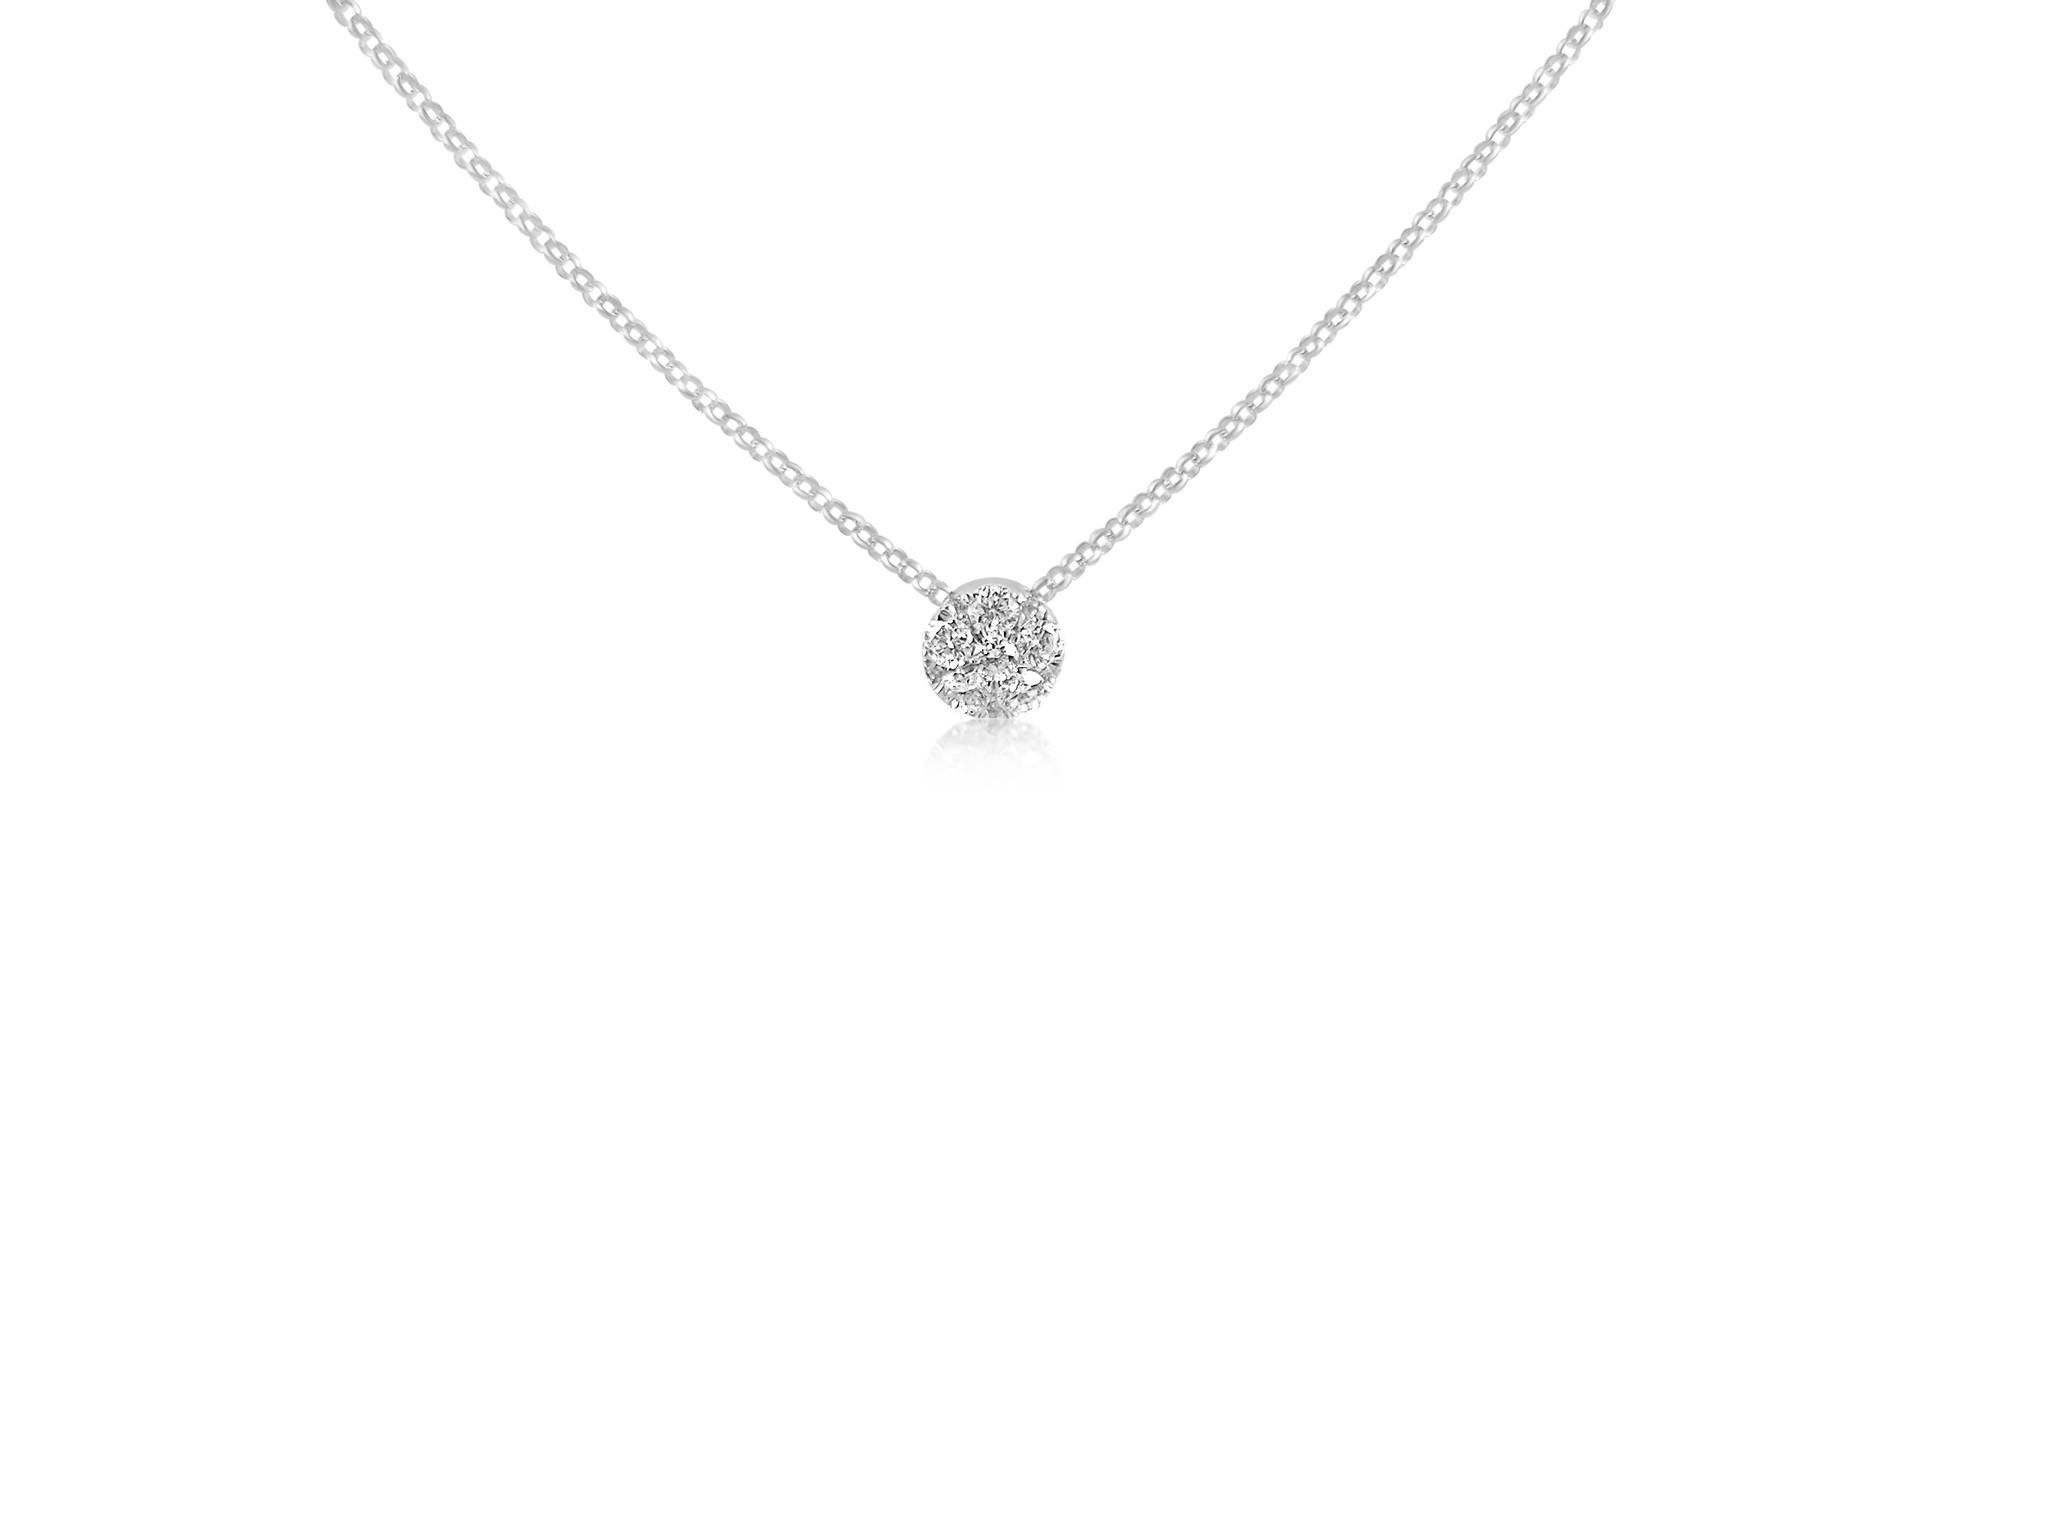 18 karat white gold chain with 0.24 ct diamonds pendants